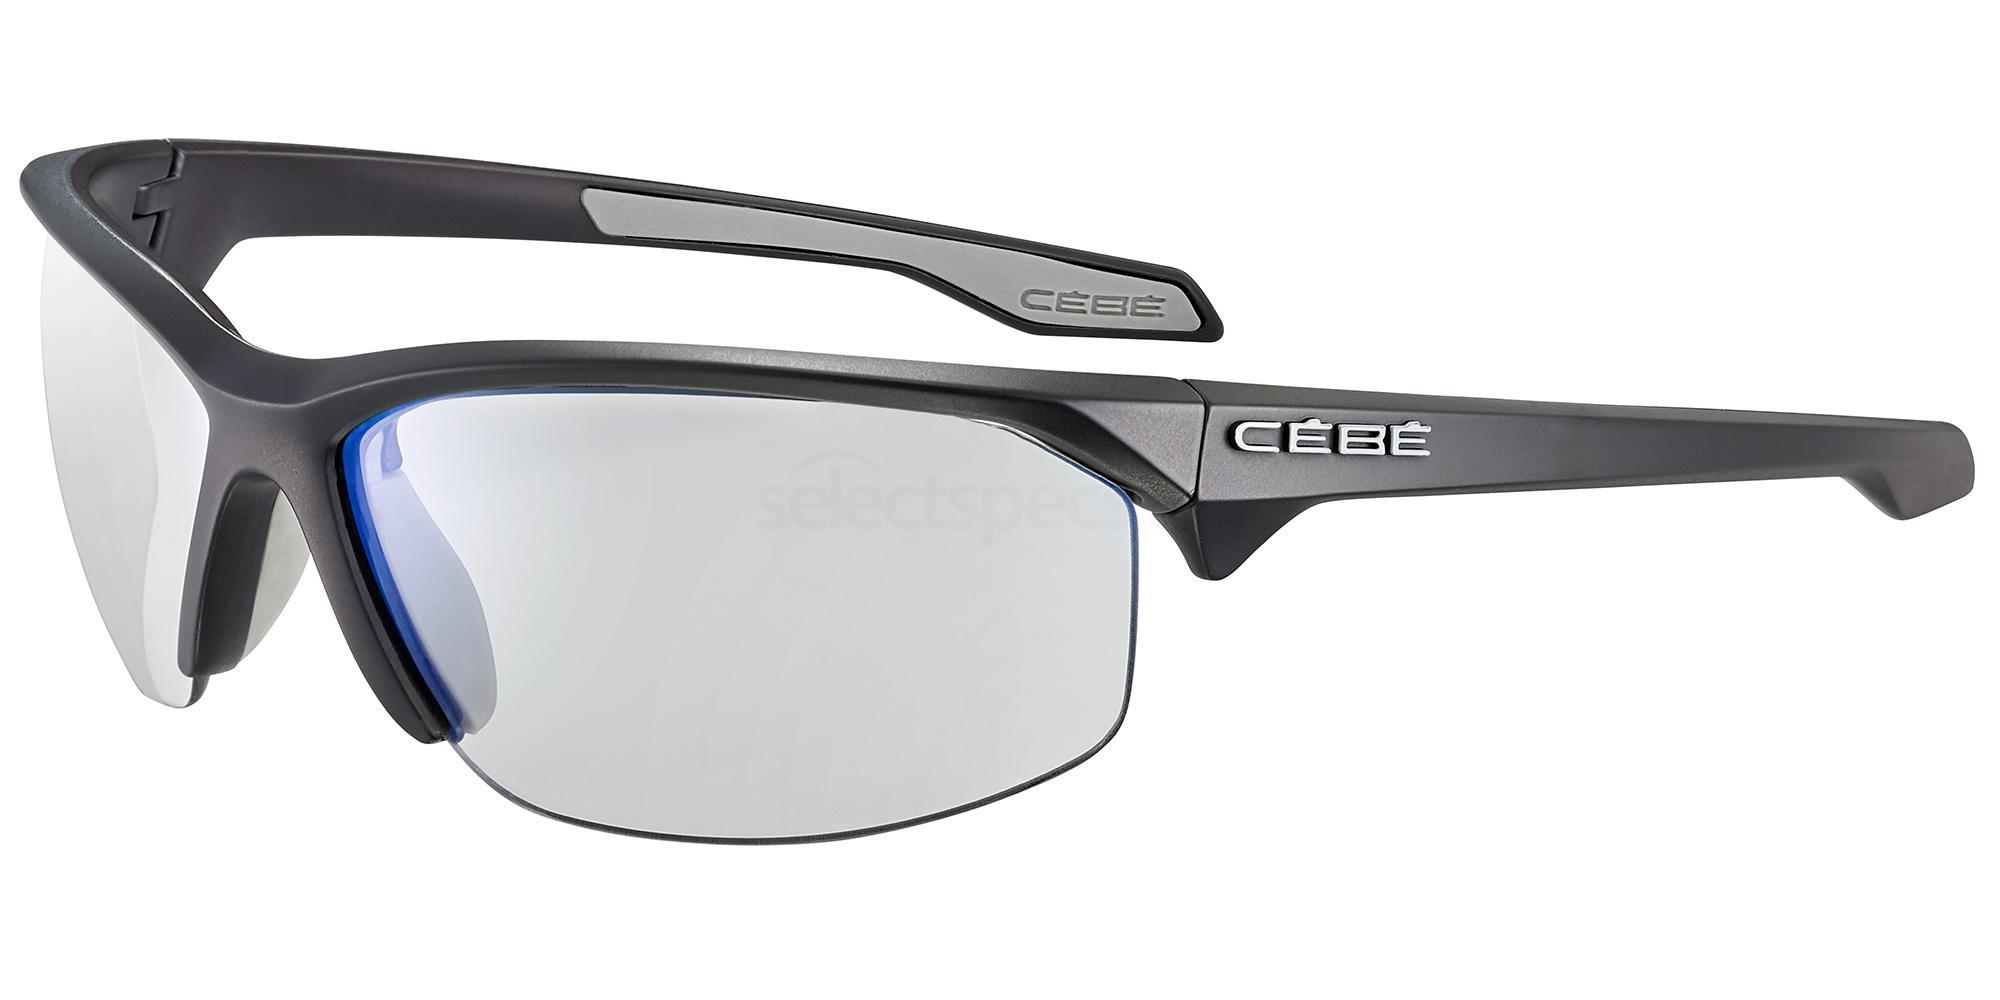 CBS094 WILD 2.0 Sunglasses, Cebe